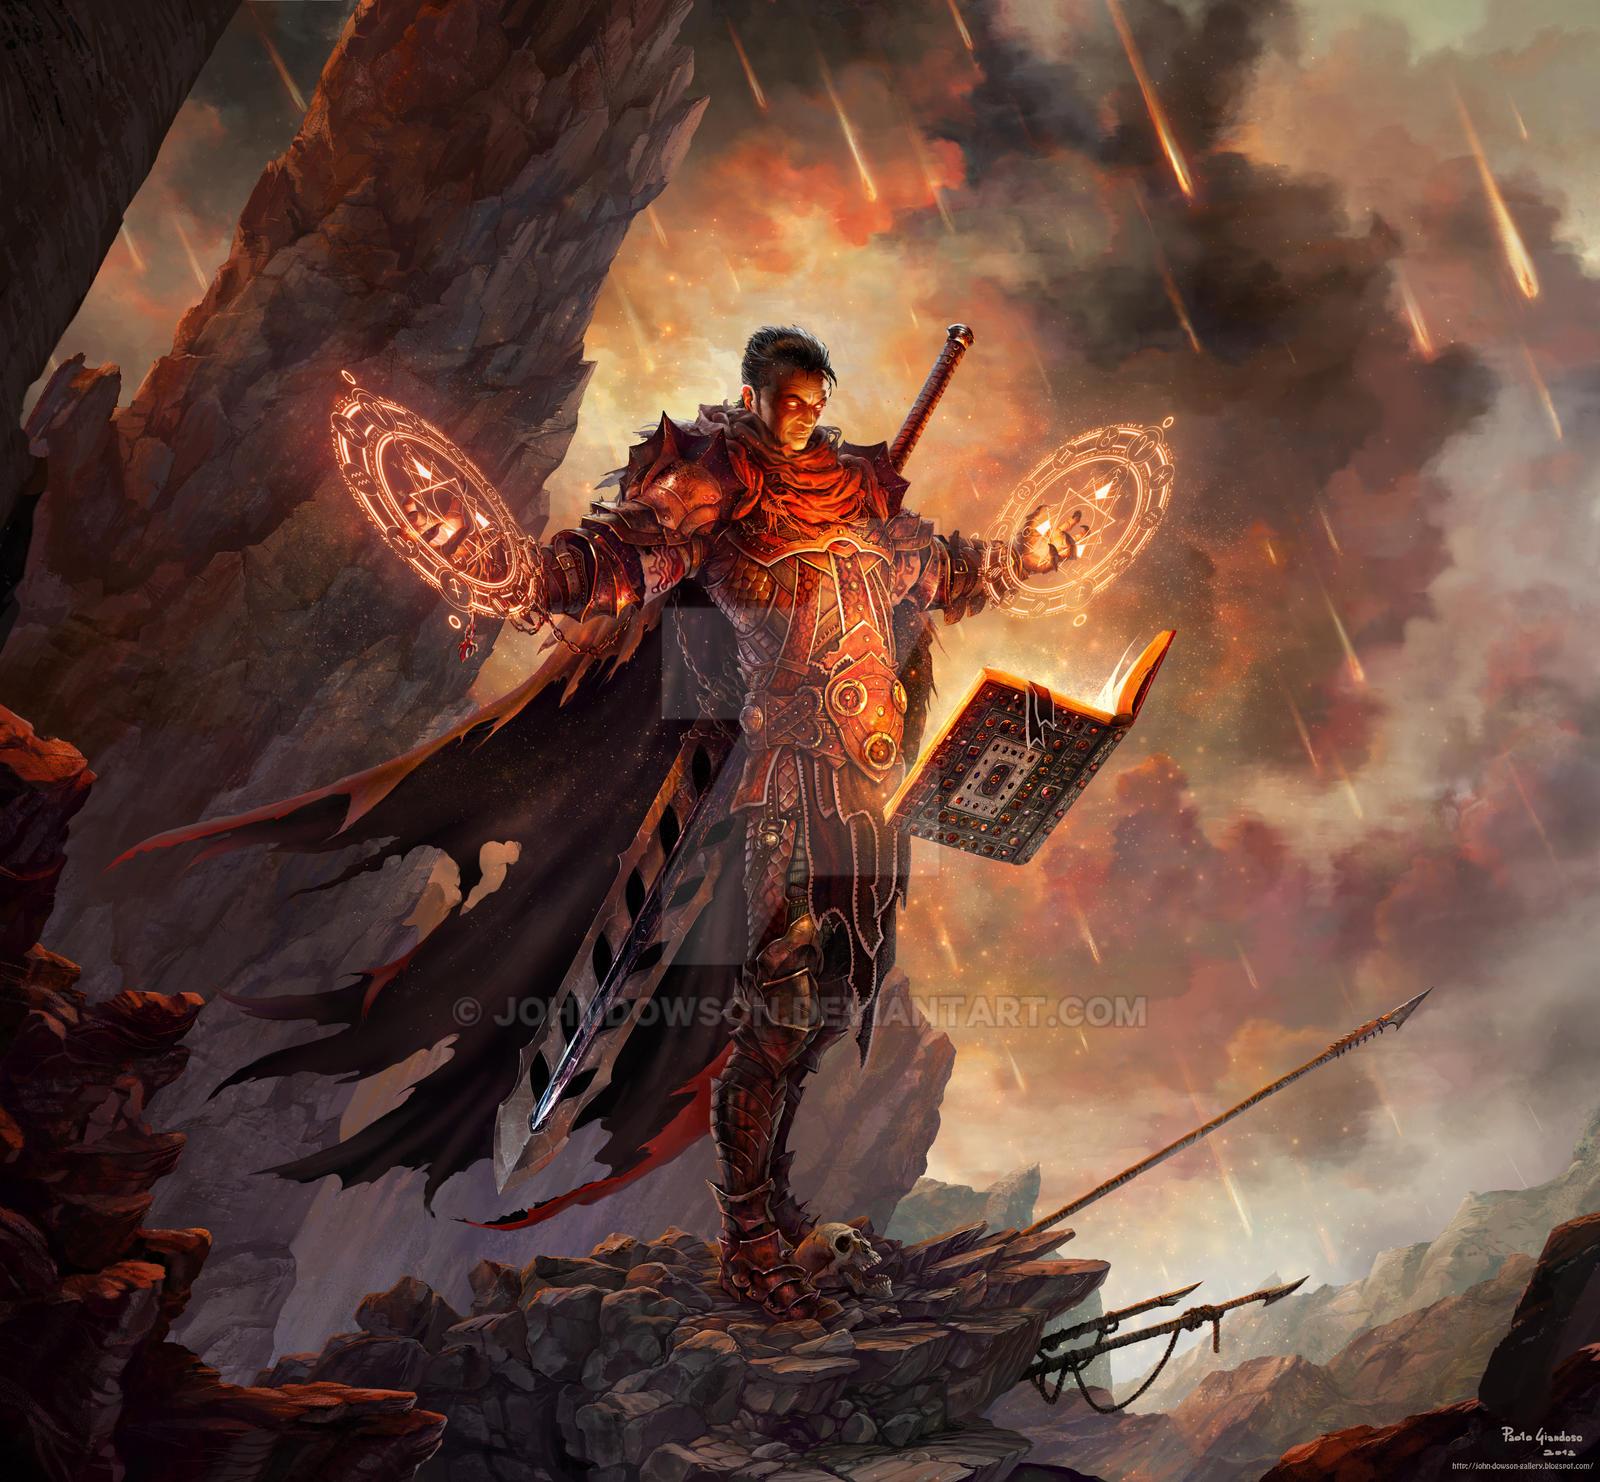 Commission: Steel Flameblade by Johndowson